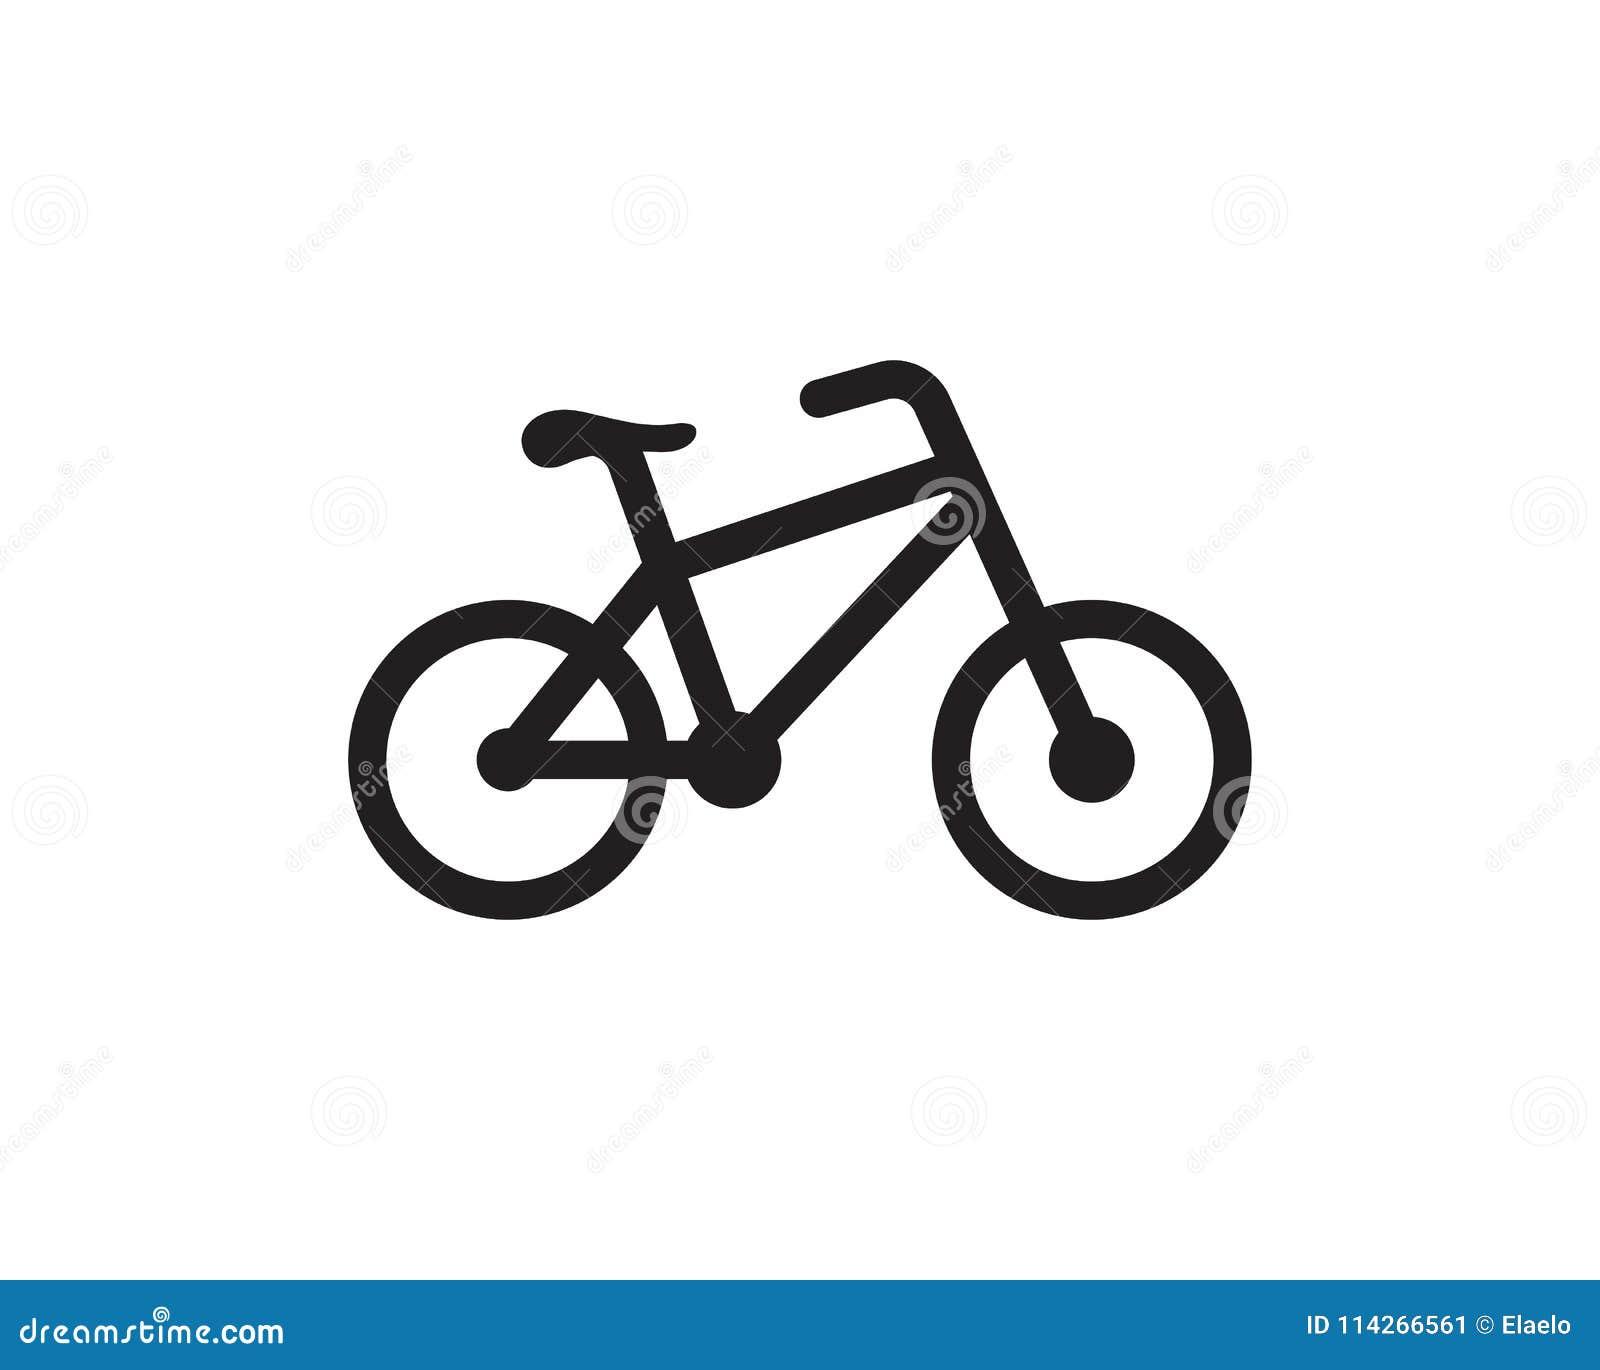 bike logo icon design template stock vector illustration of